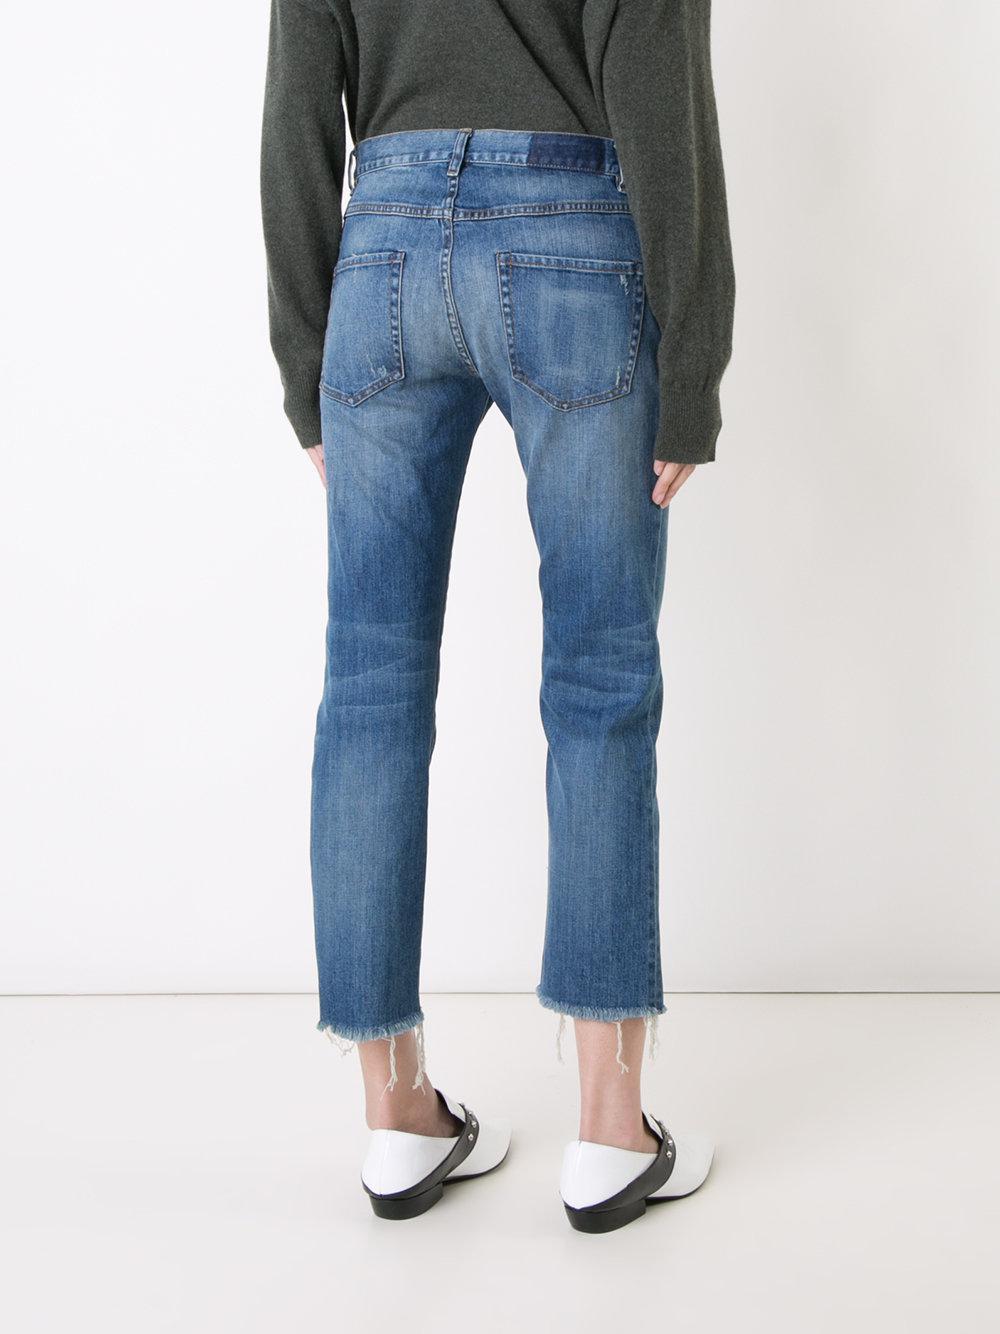 Nili Lotan Denim Cropped Jeans in Blue